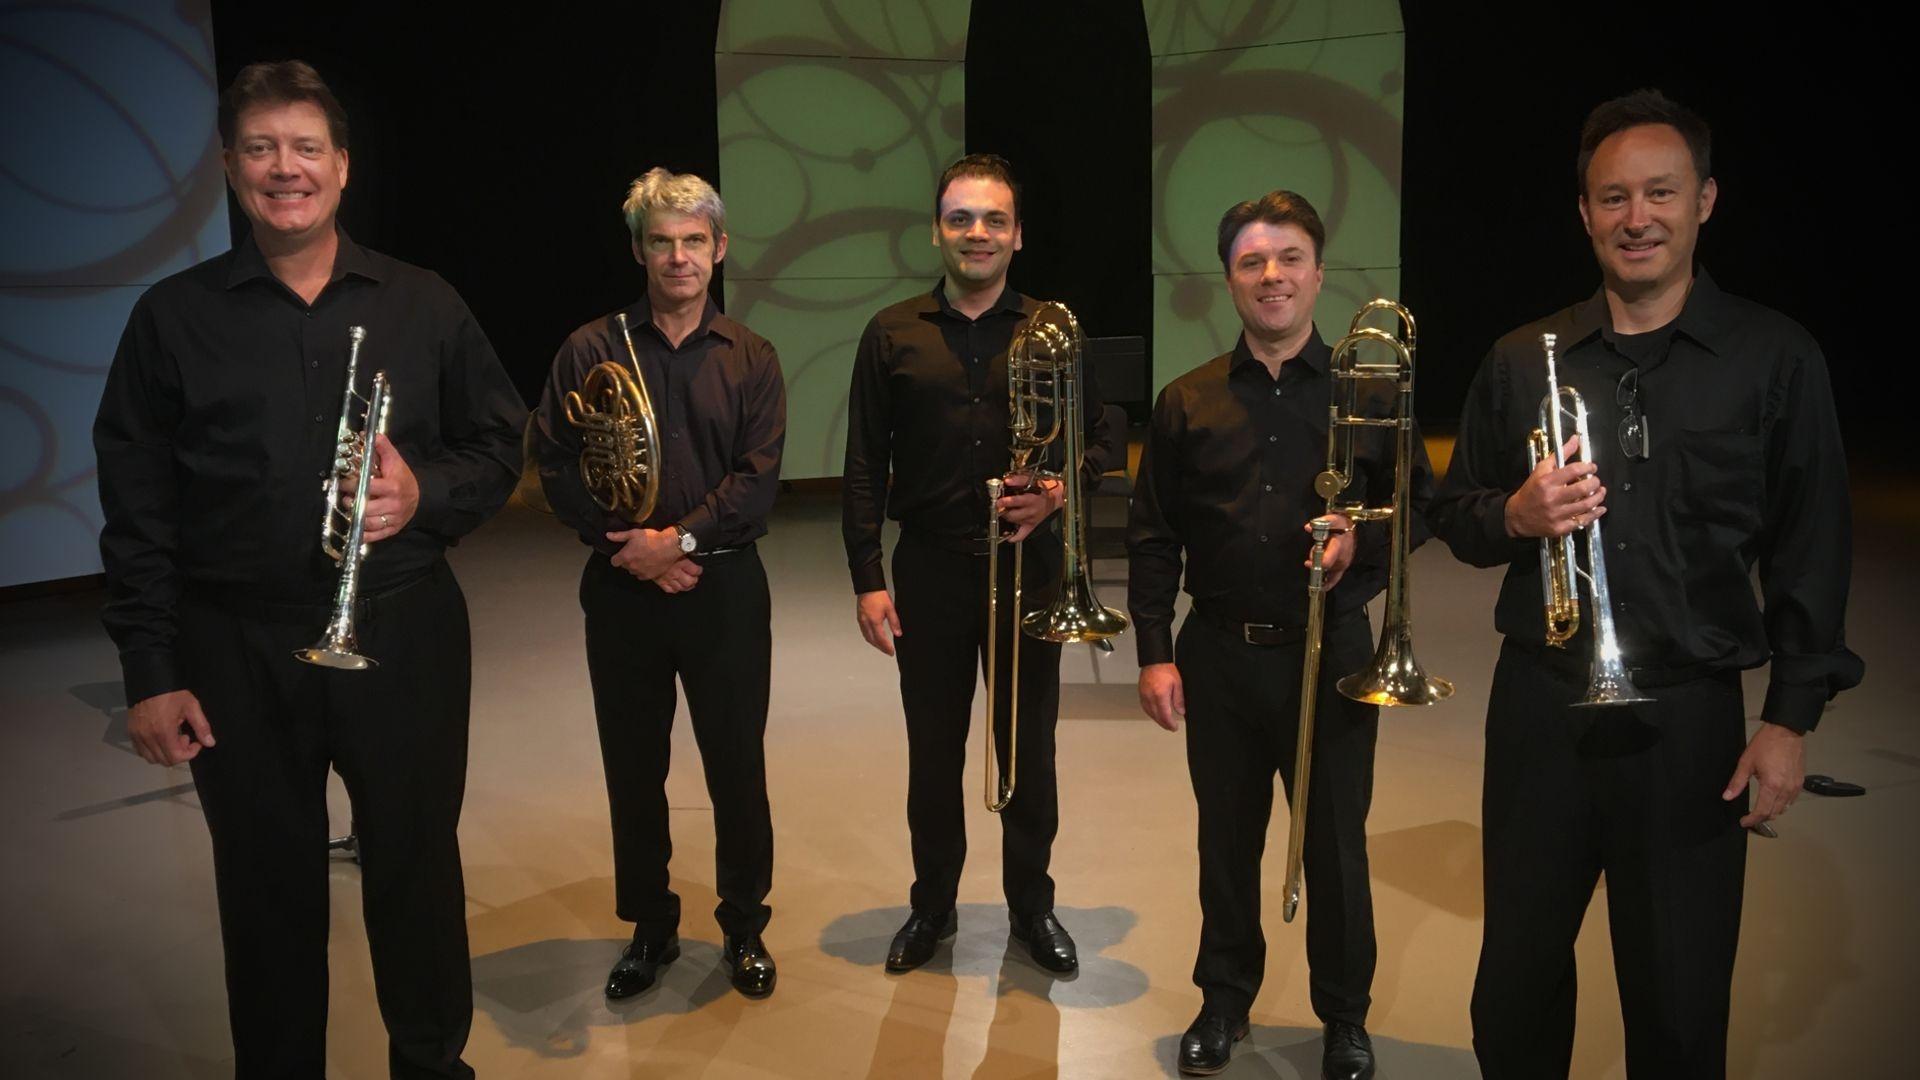 BPO's Brass Quintet